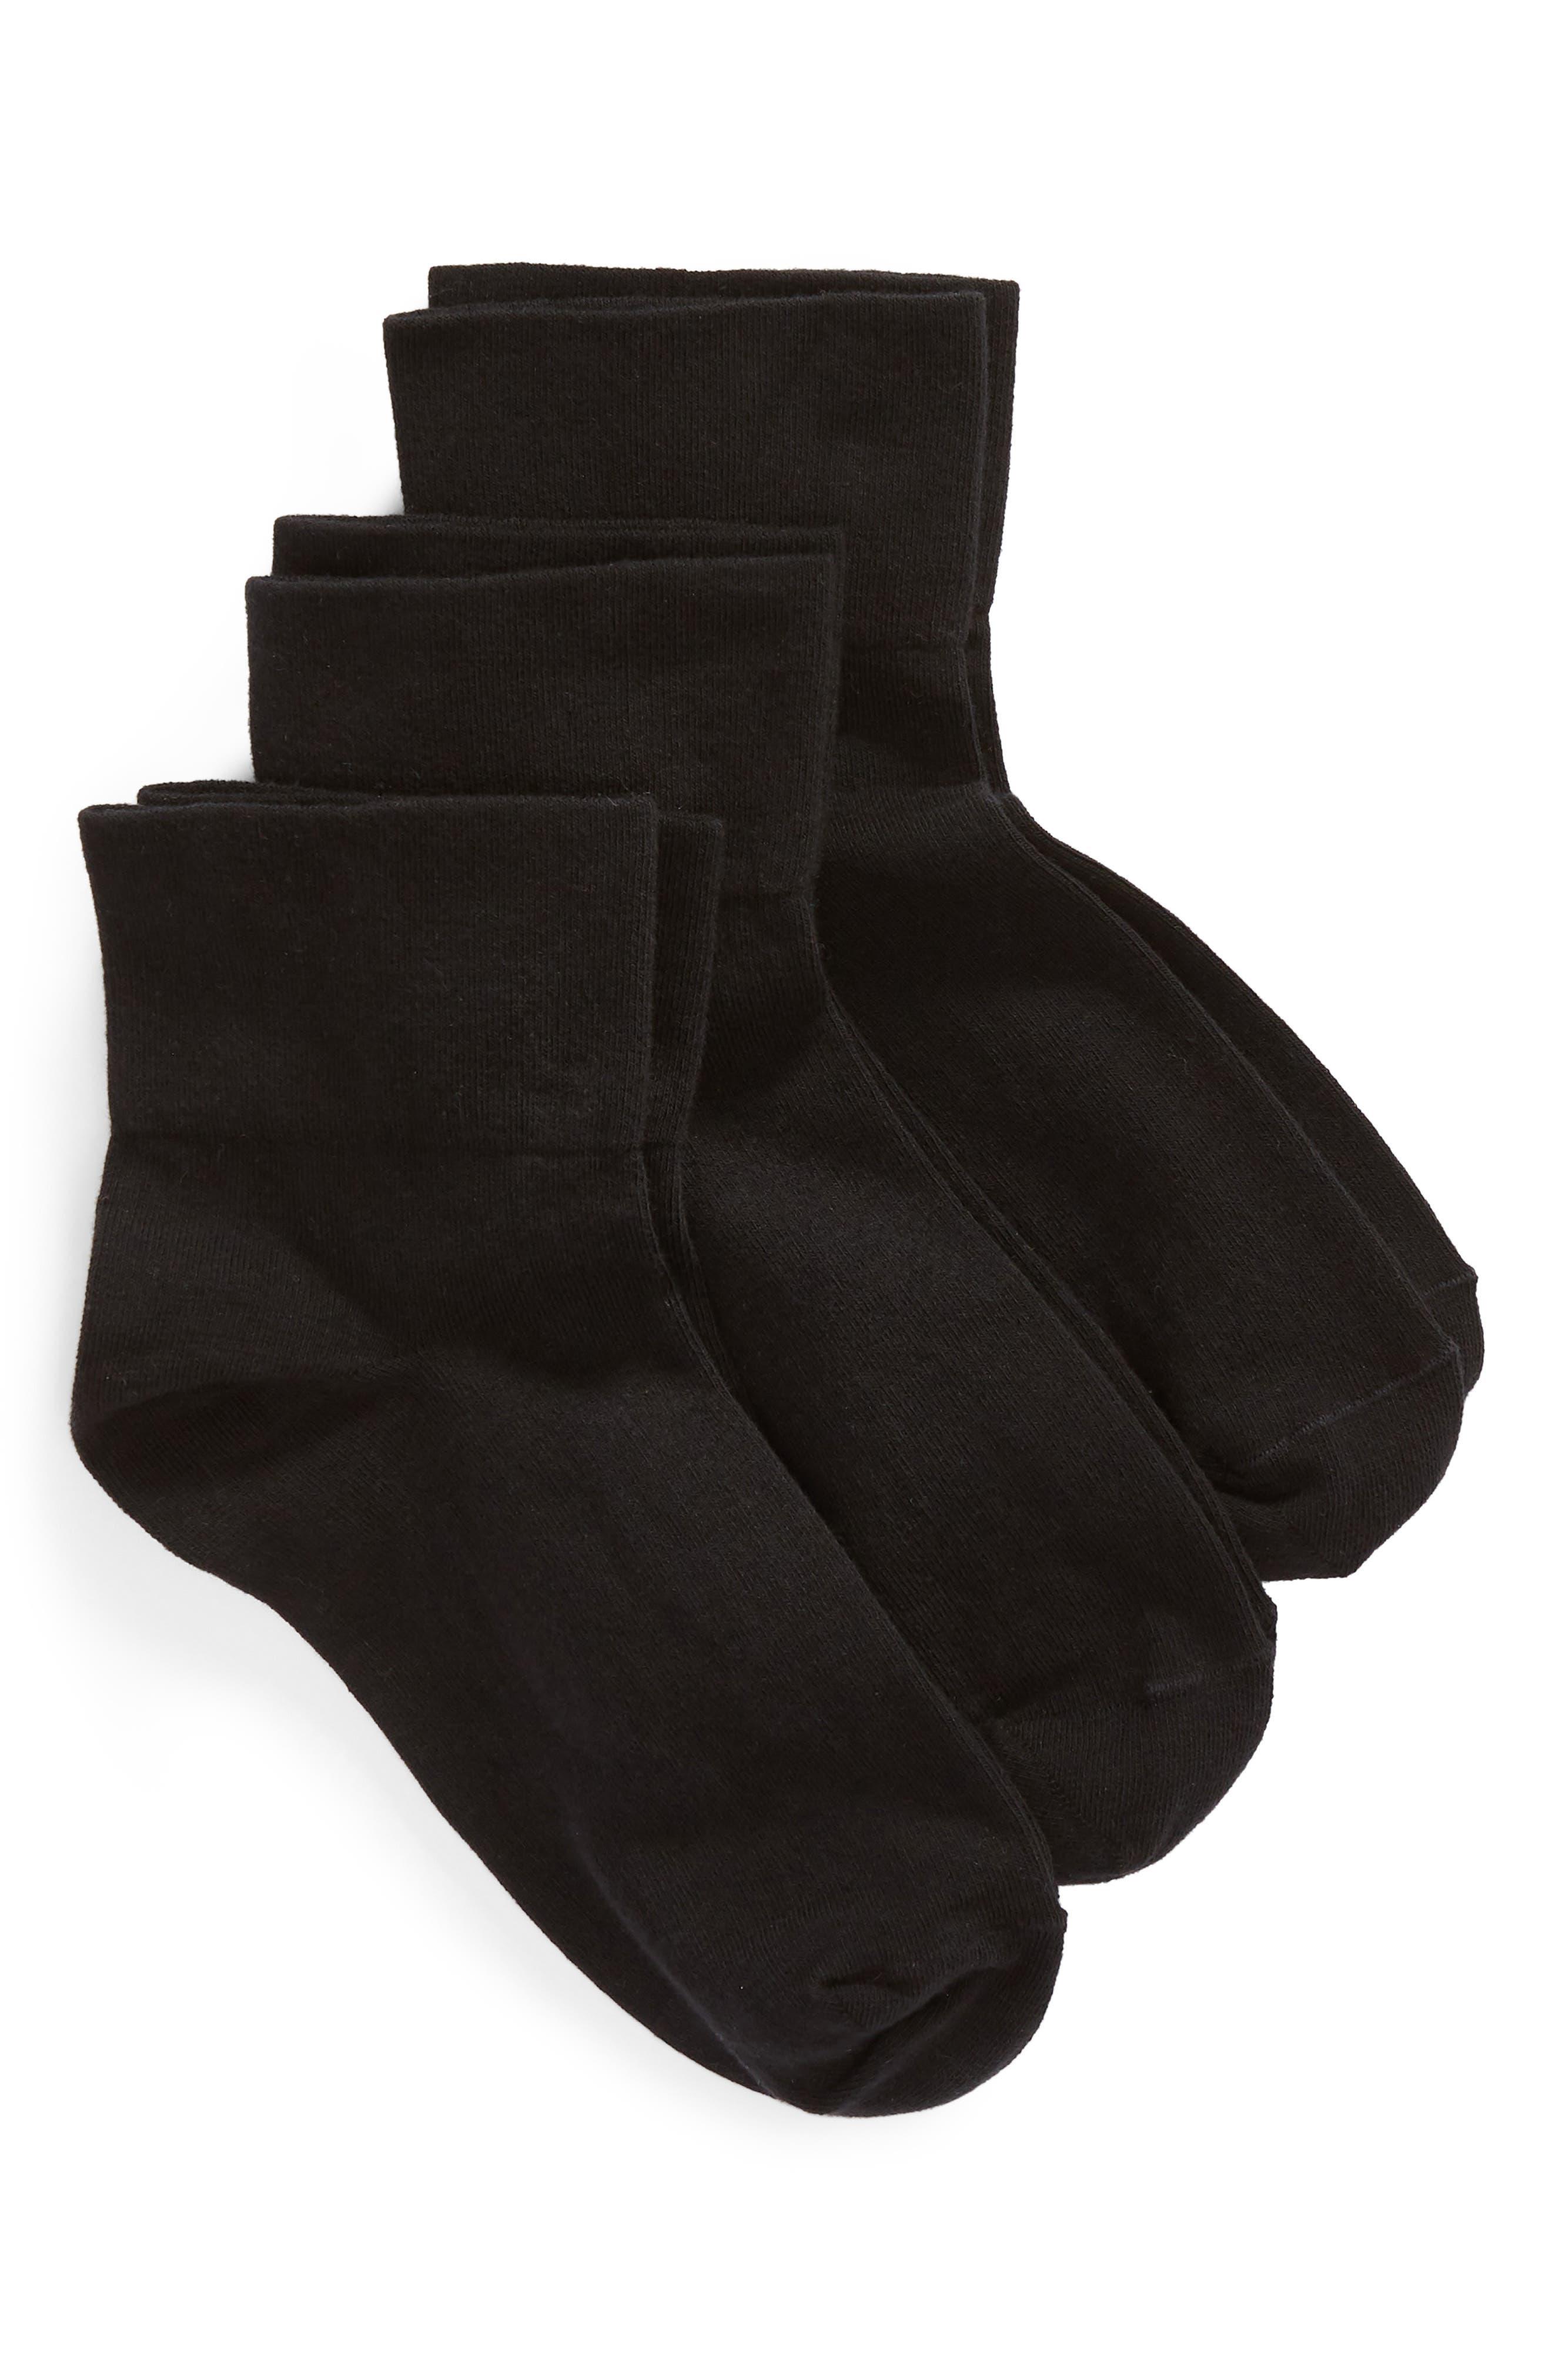 Everyday 3-Pack Ankle Socks,                         Main,                         color, BLACK